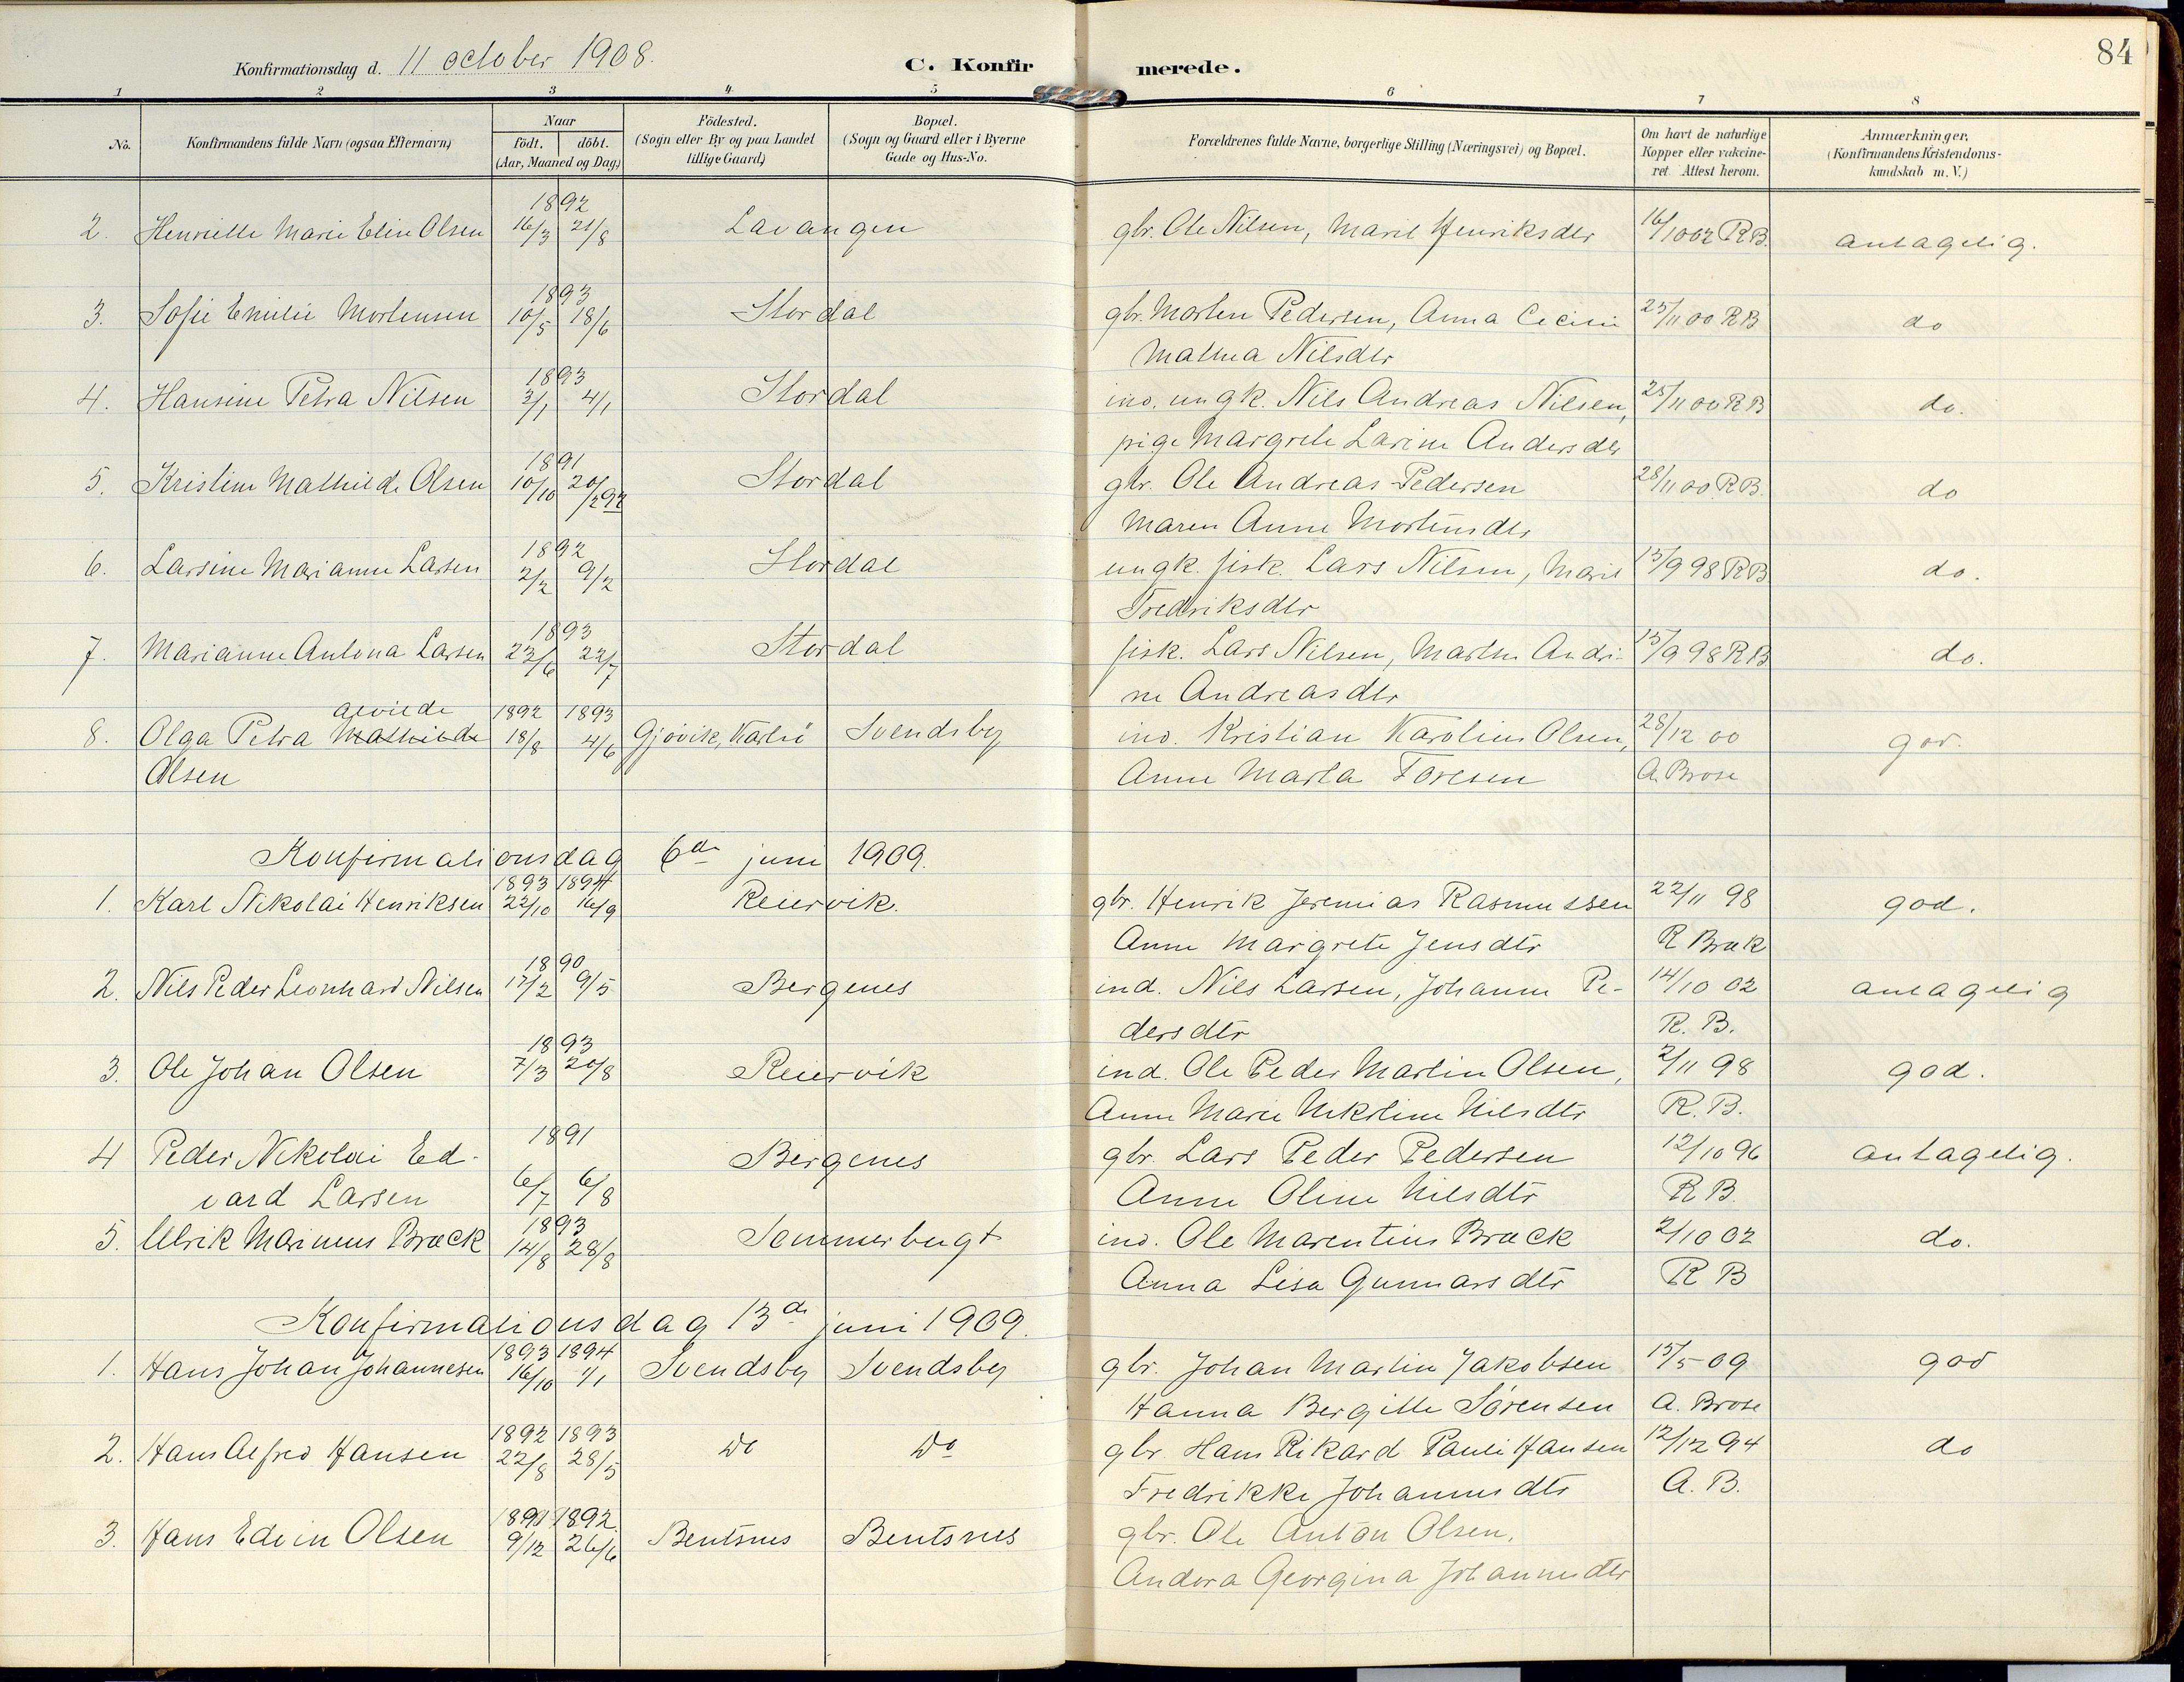 SATØ, Lyngen sokneprestembete, Ministerialbok nr. 14, 1905-1920, s. 84